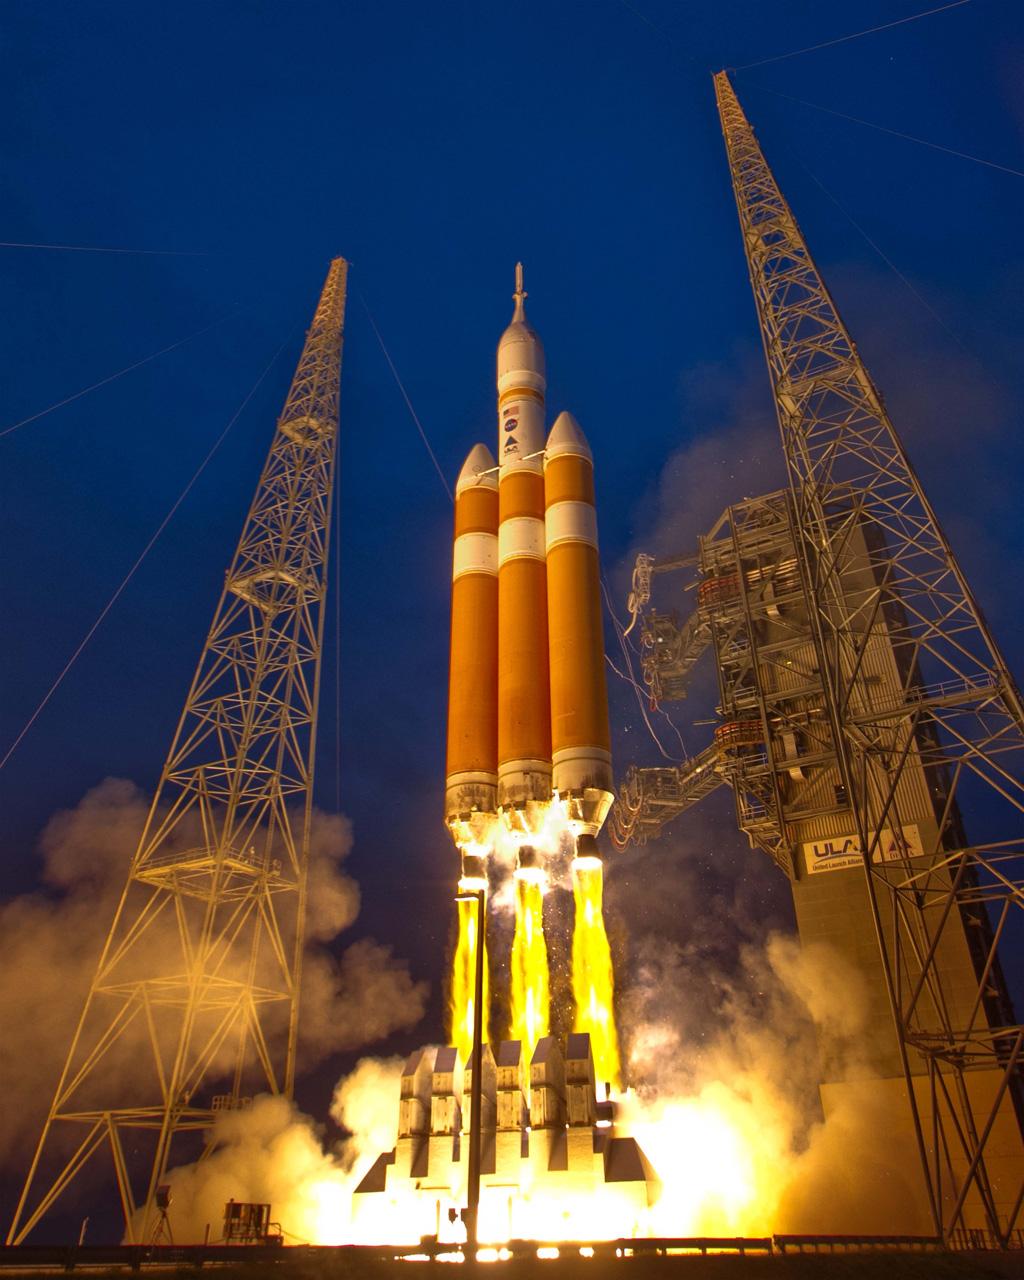 nasa orion launch hq high res photos (6)